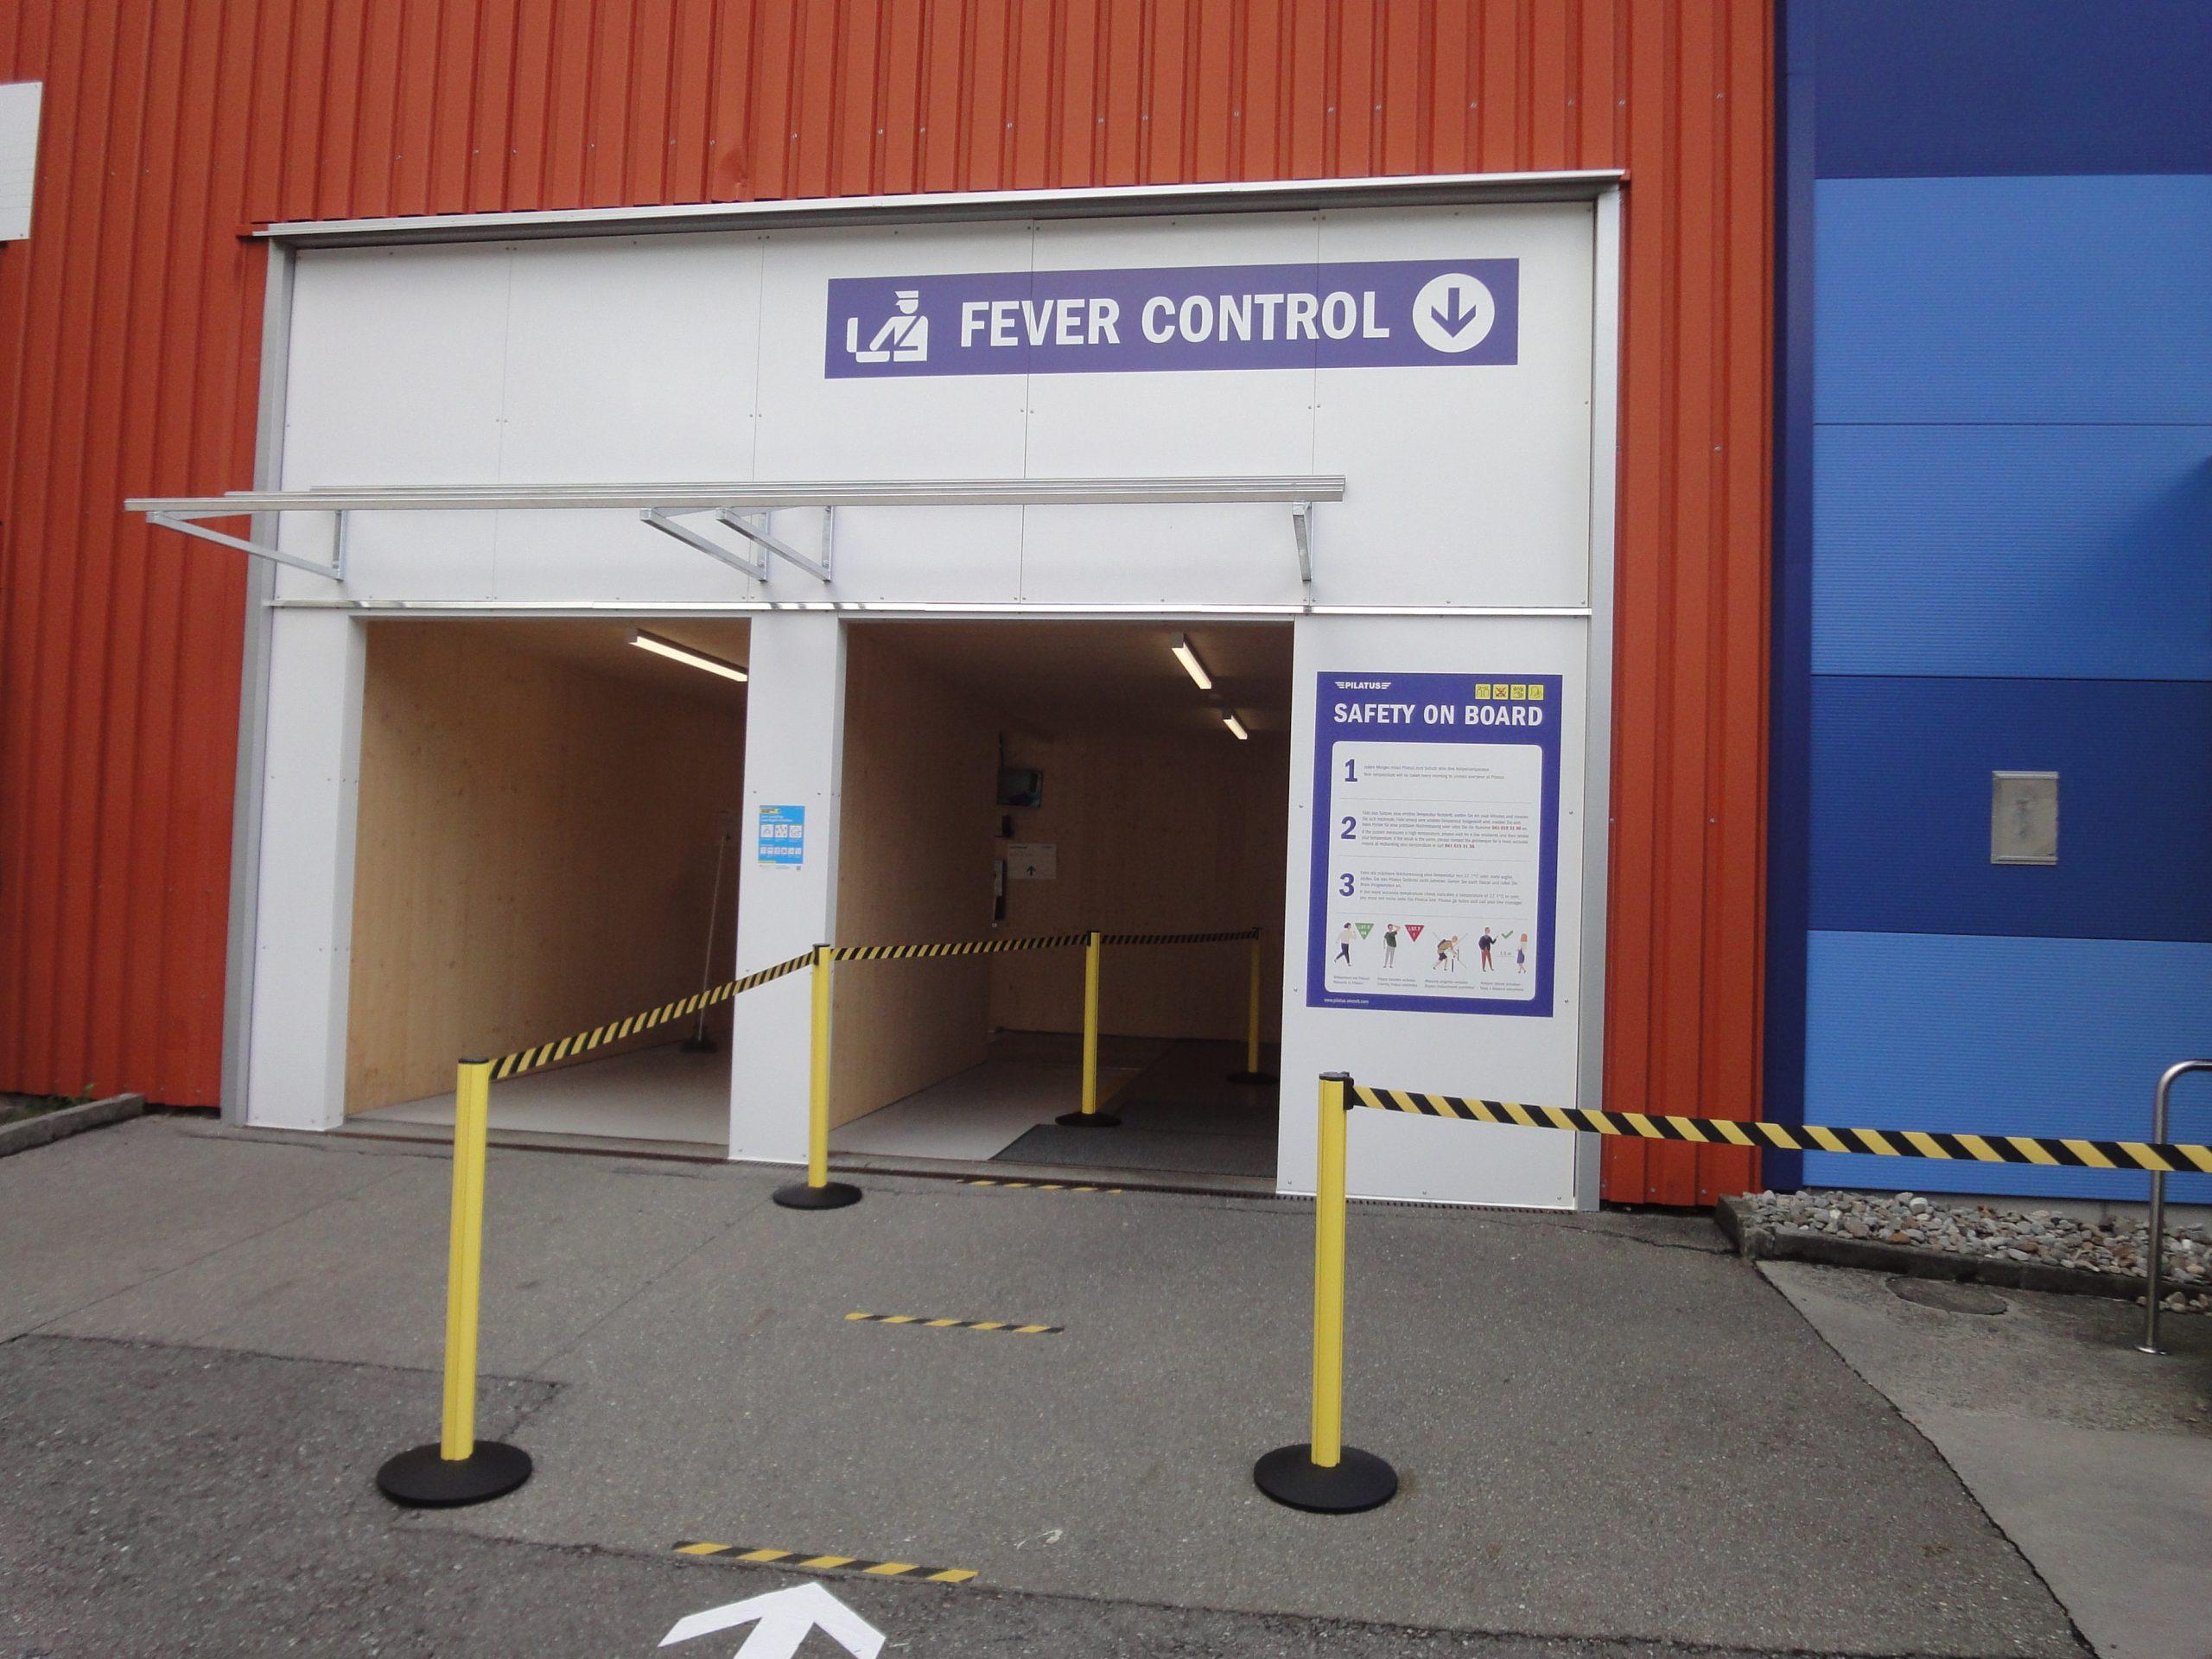 Entrance fever control Pilatus Flugzeugwerke AG